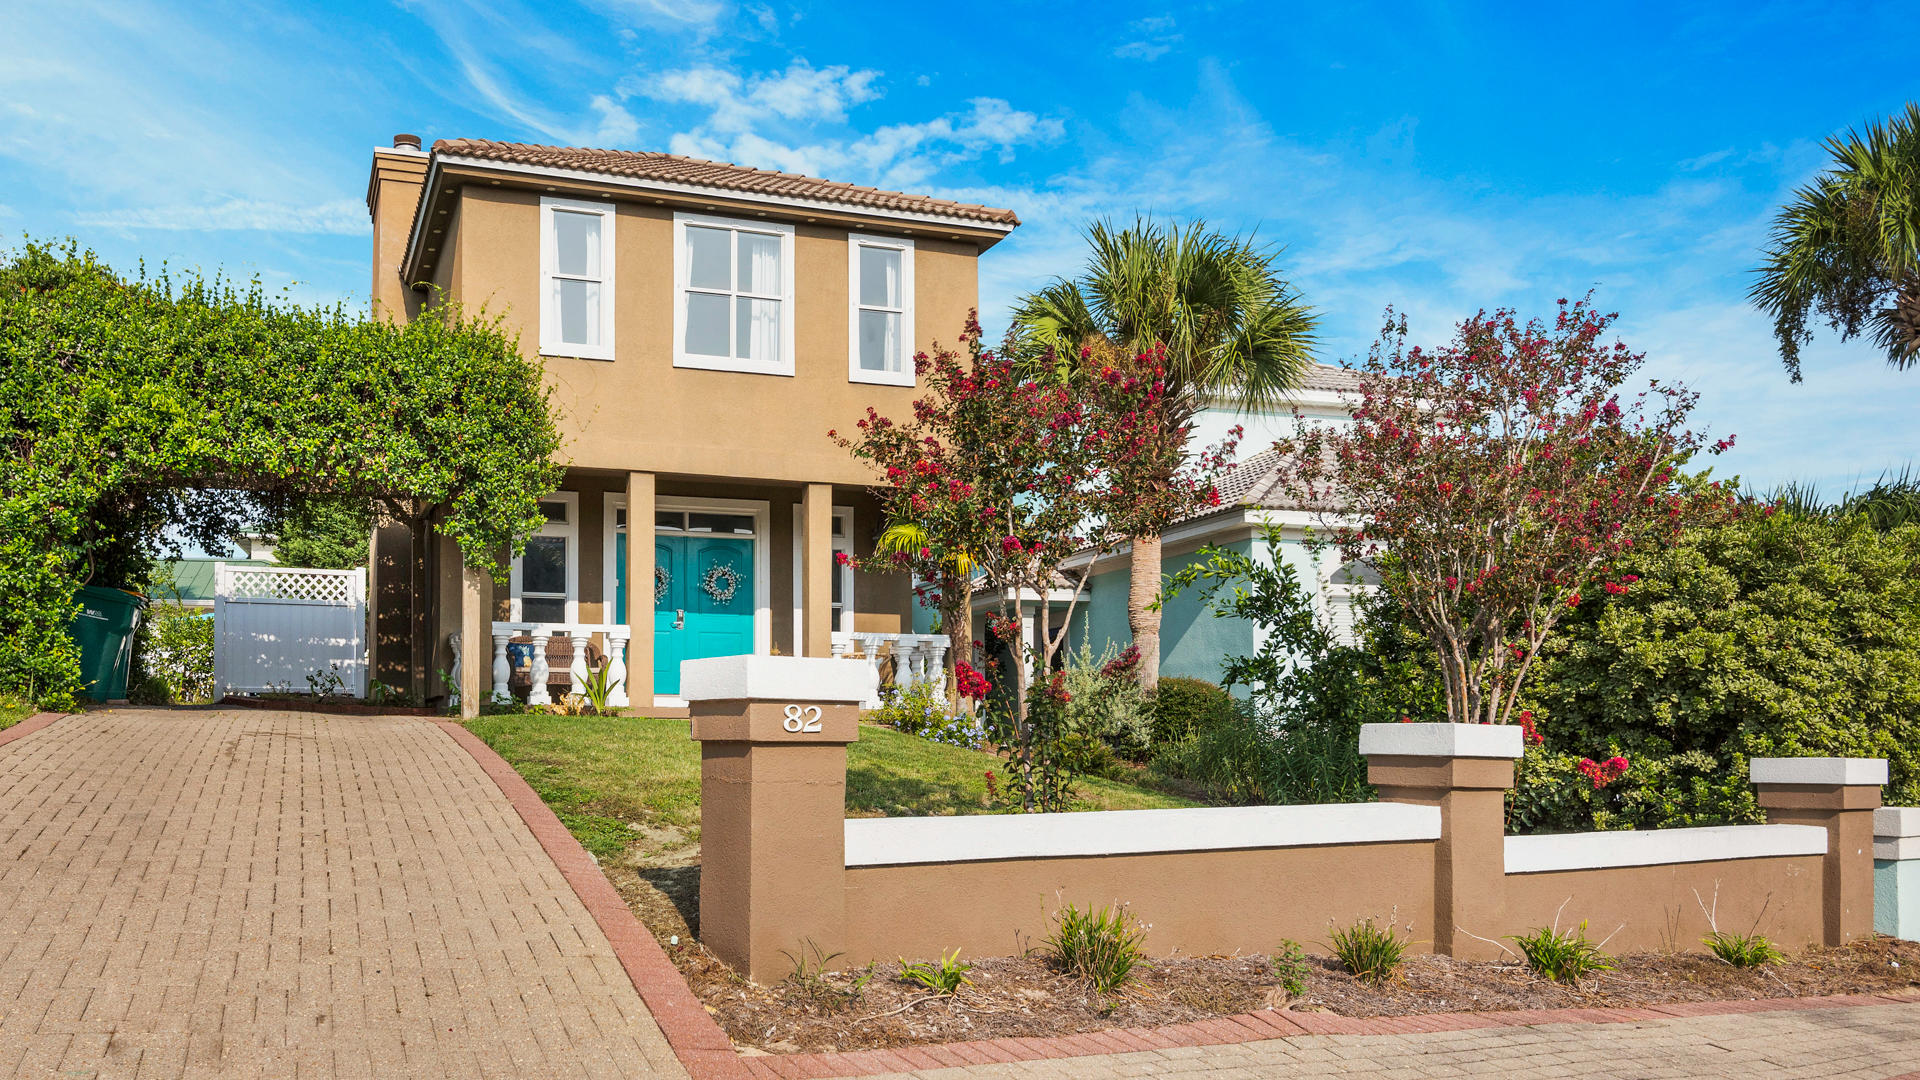 Photo of home for sale at 82 Terra Cotta, Destin FL